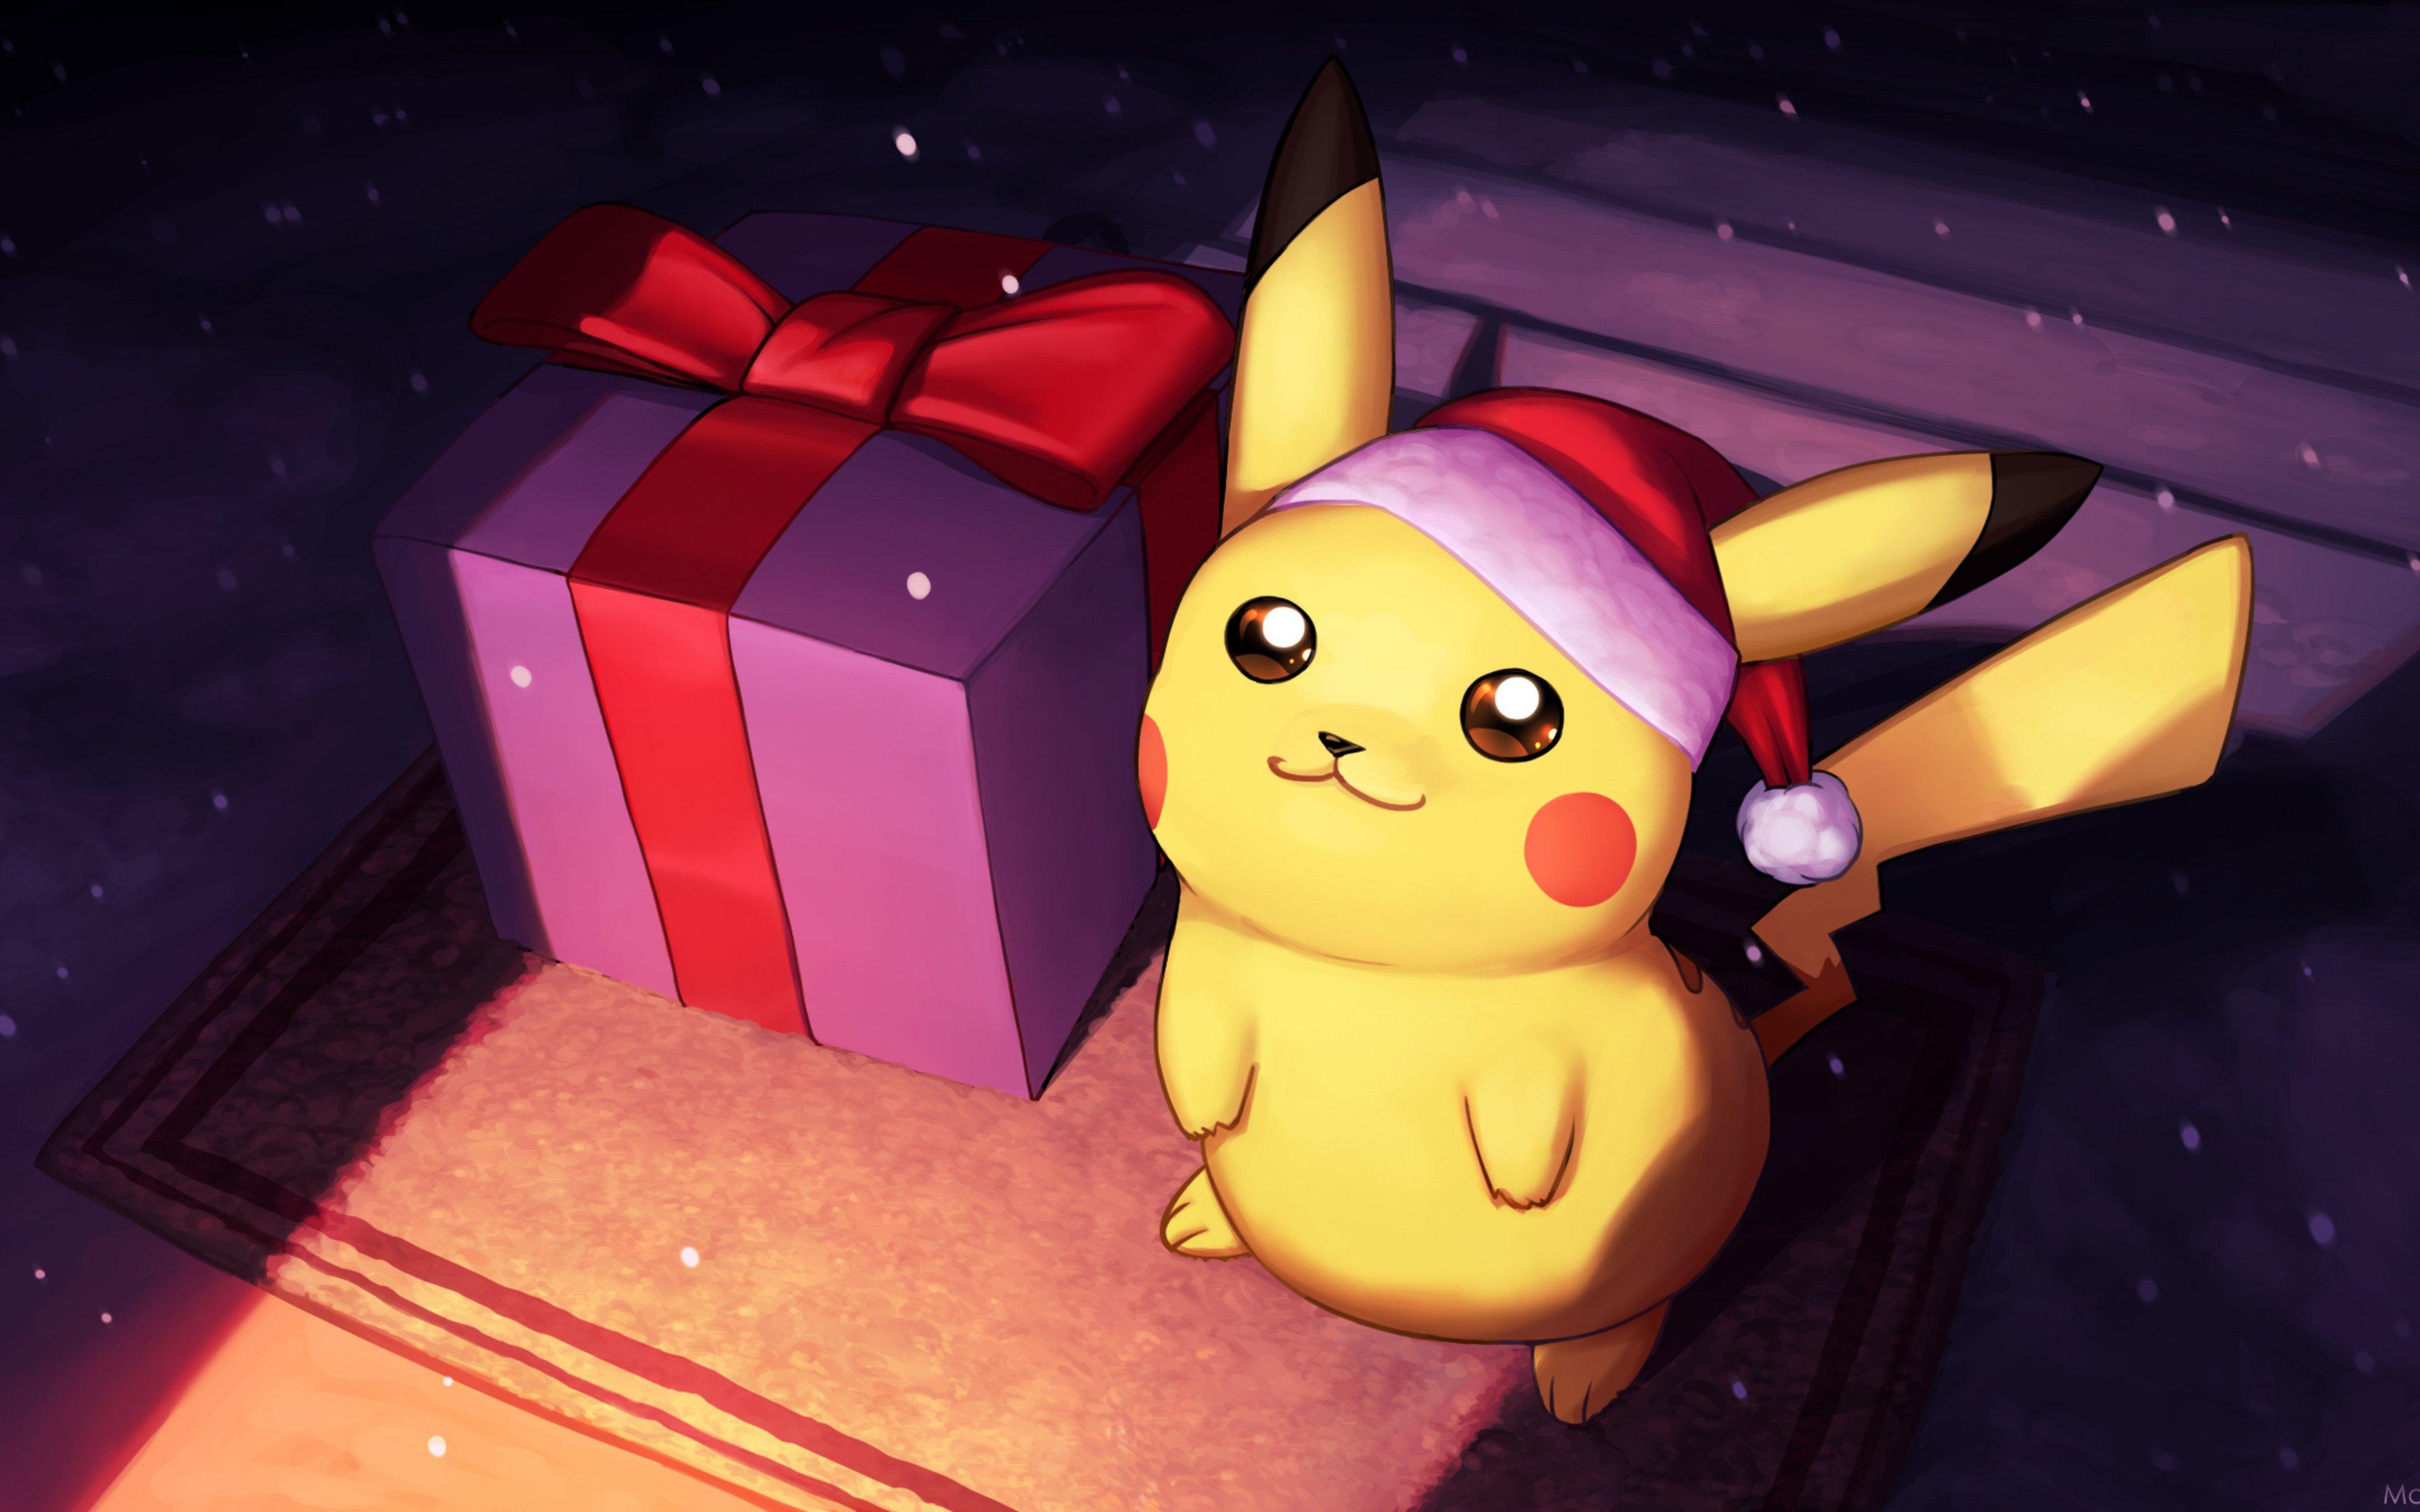 Wallpaper Pikachu on christmas day